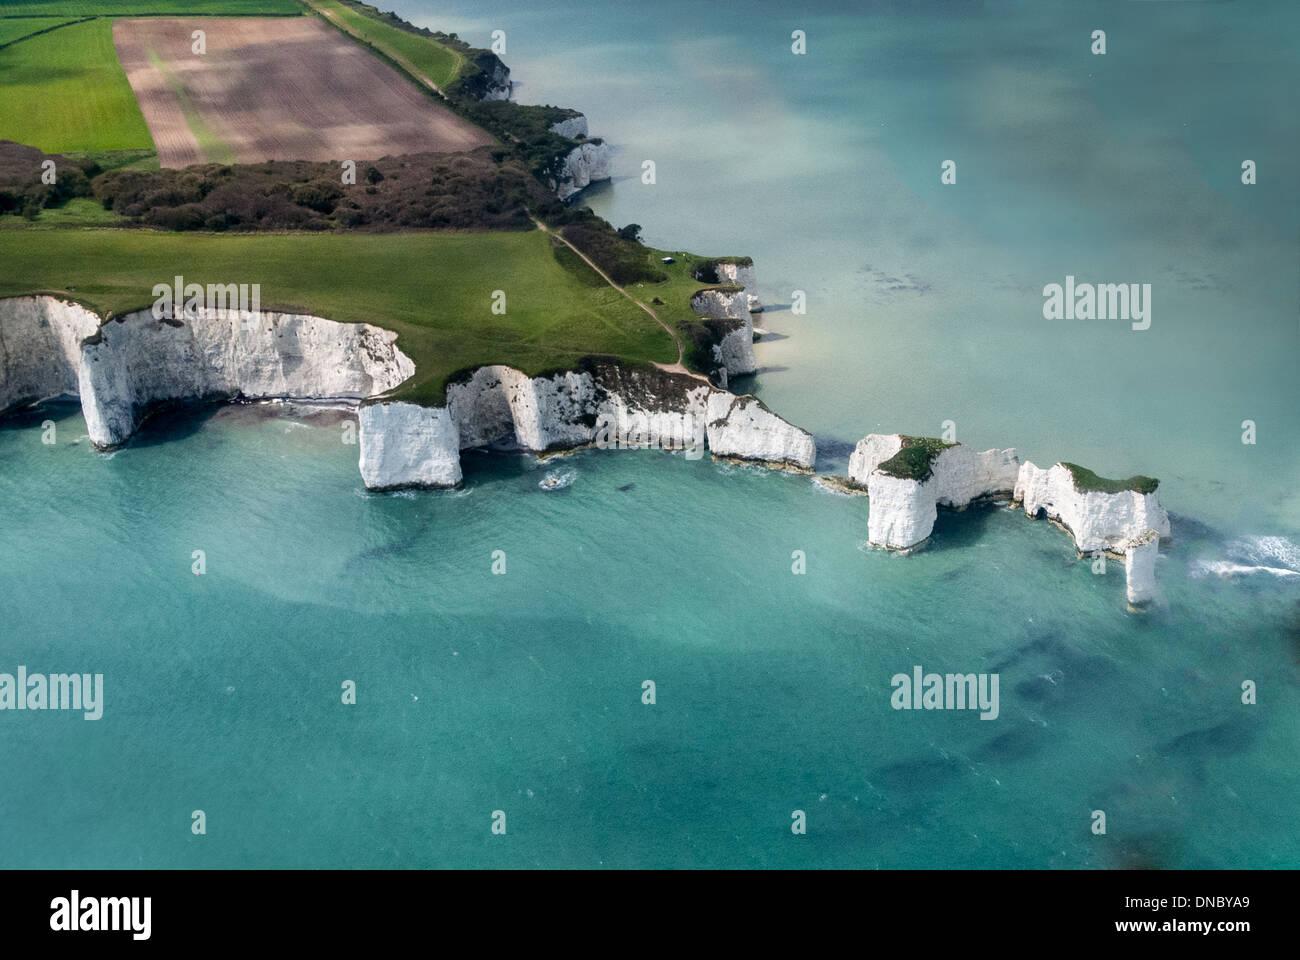 Aerial Image of Old Harry Rocks Handfast Point, Studland, Isle of Purbeck, Dorset, England, United Kingdom, - Stock Image